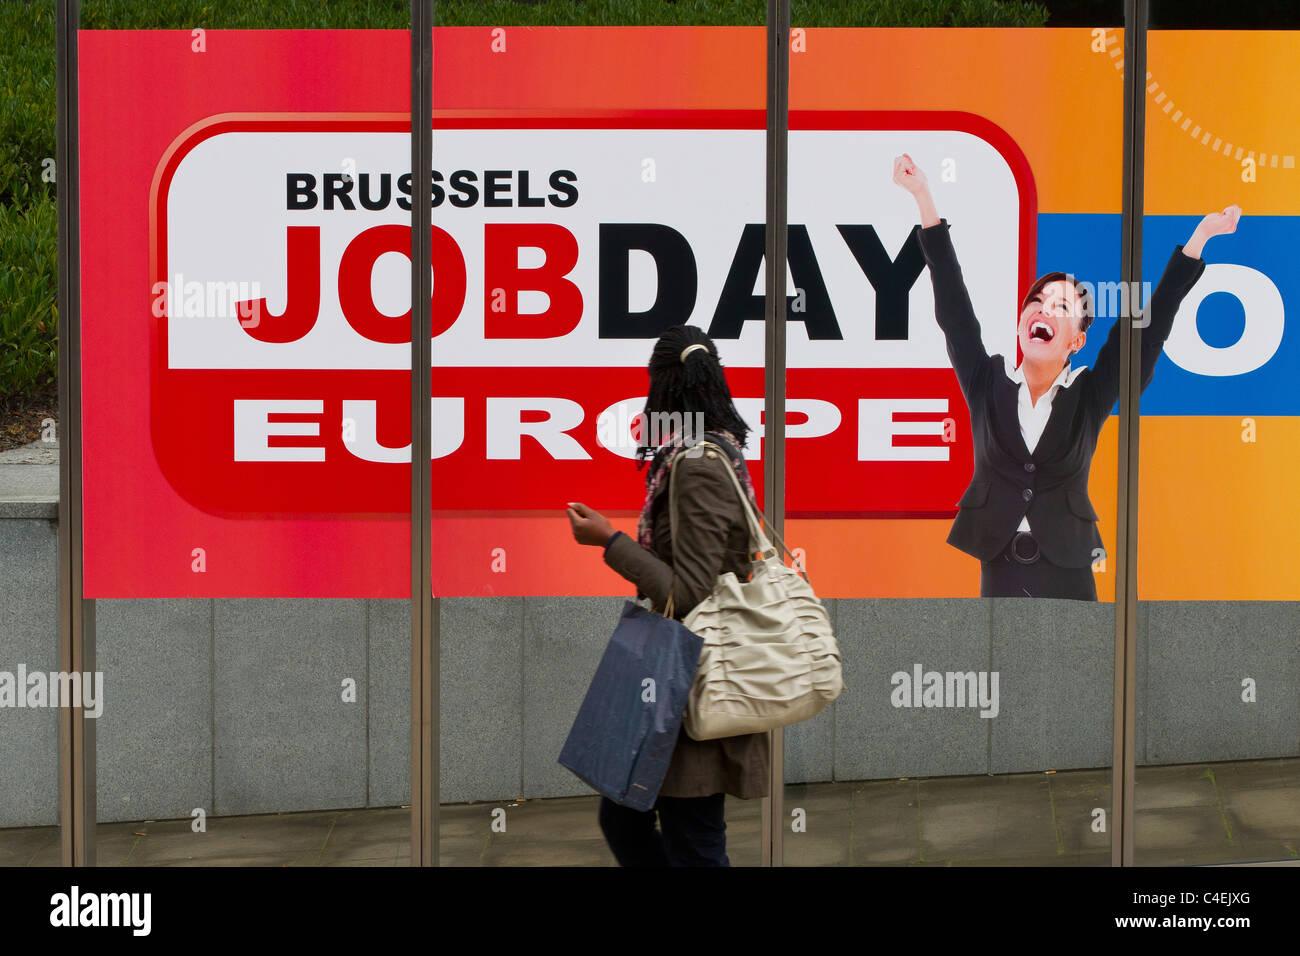 jobday publicity poster advertisement banner brussels belgium - Stock Image